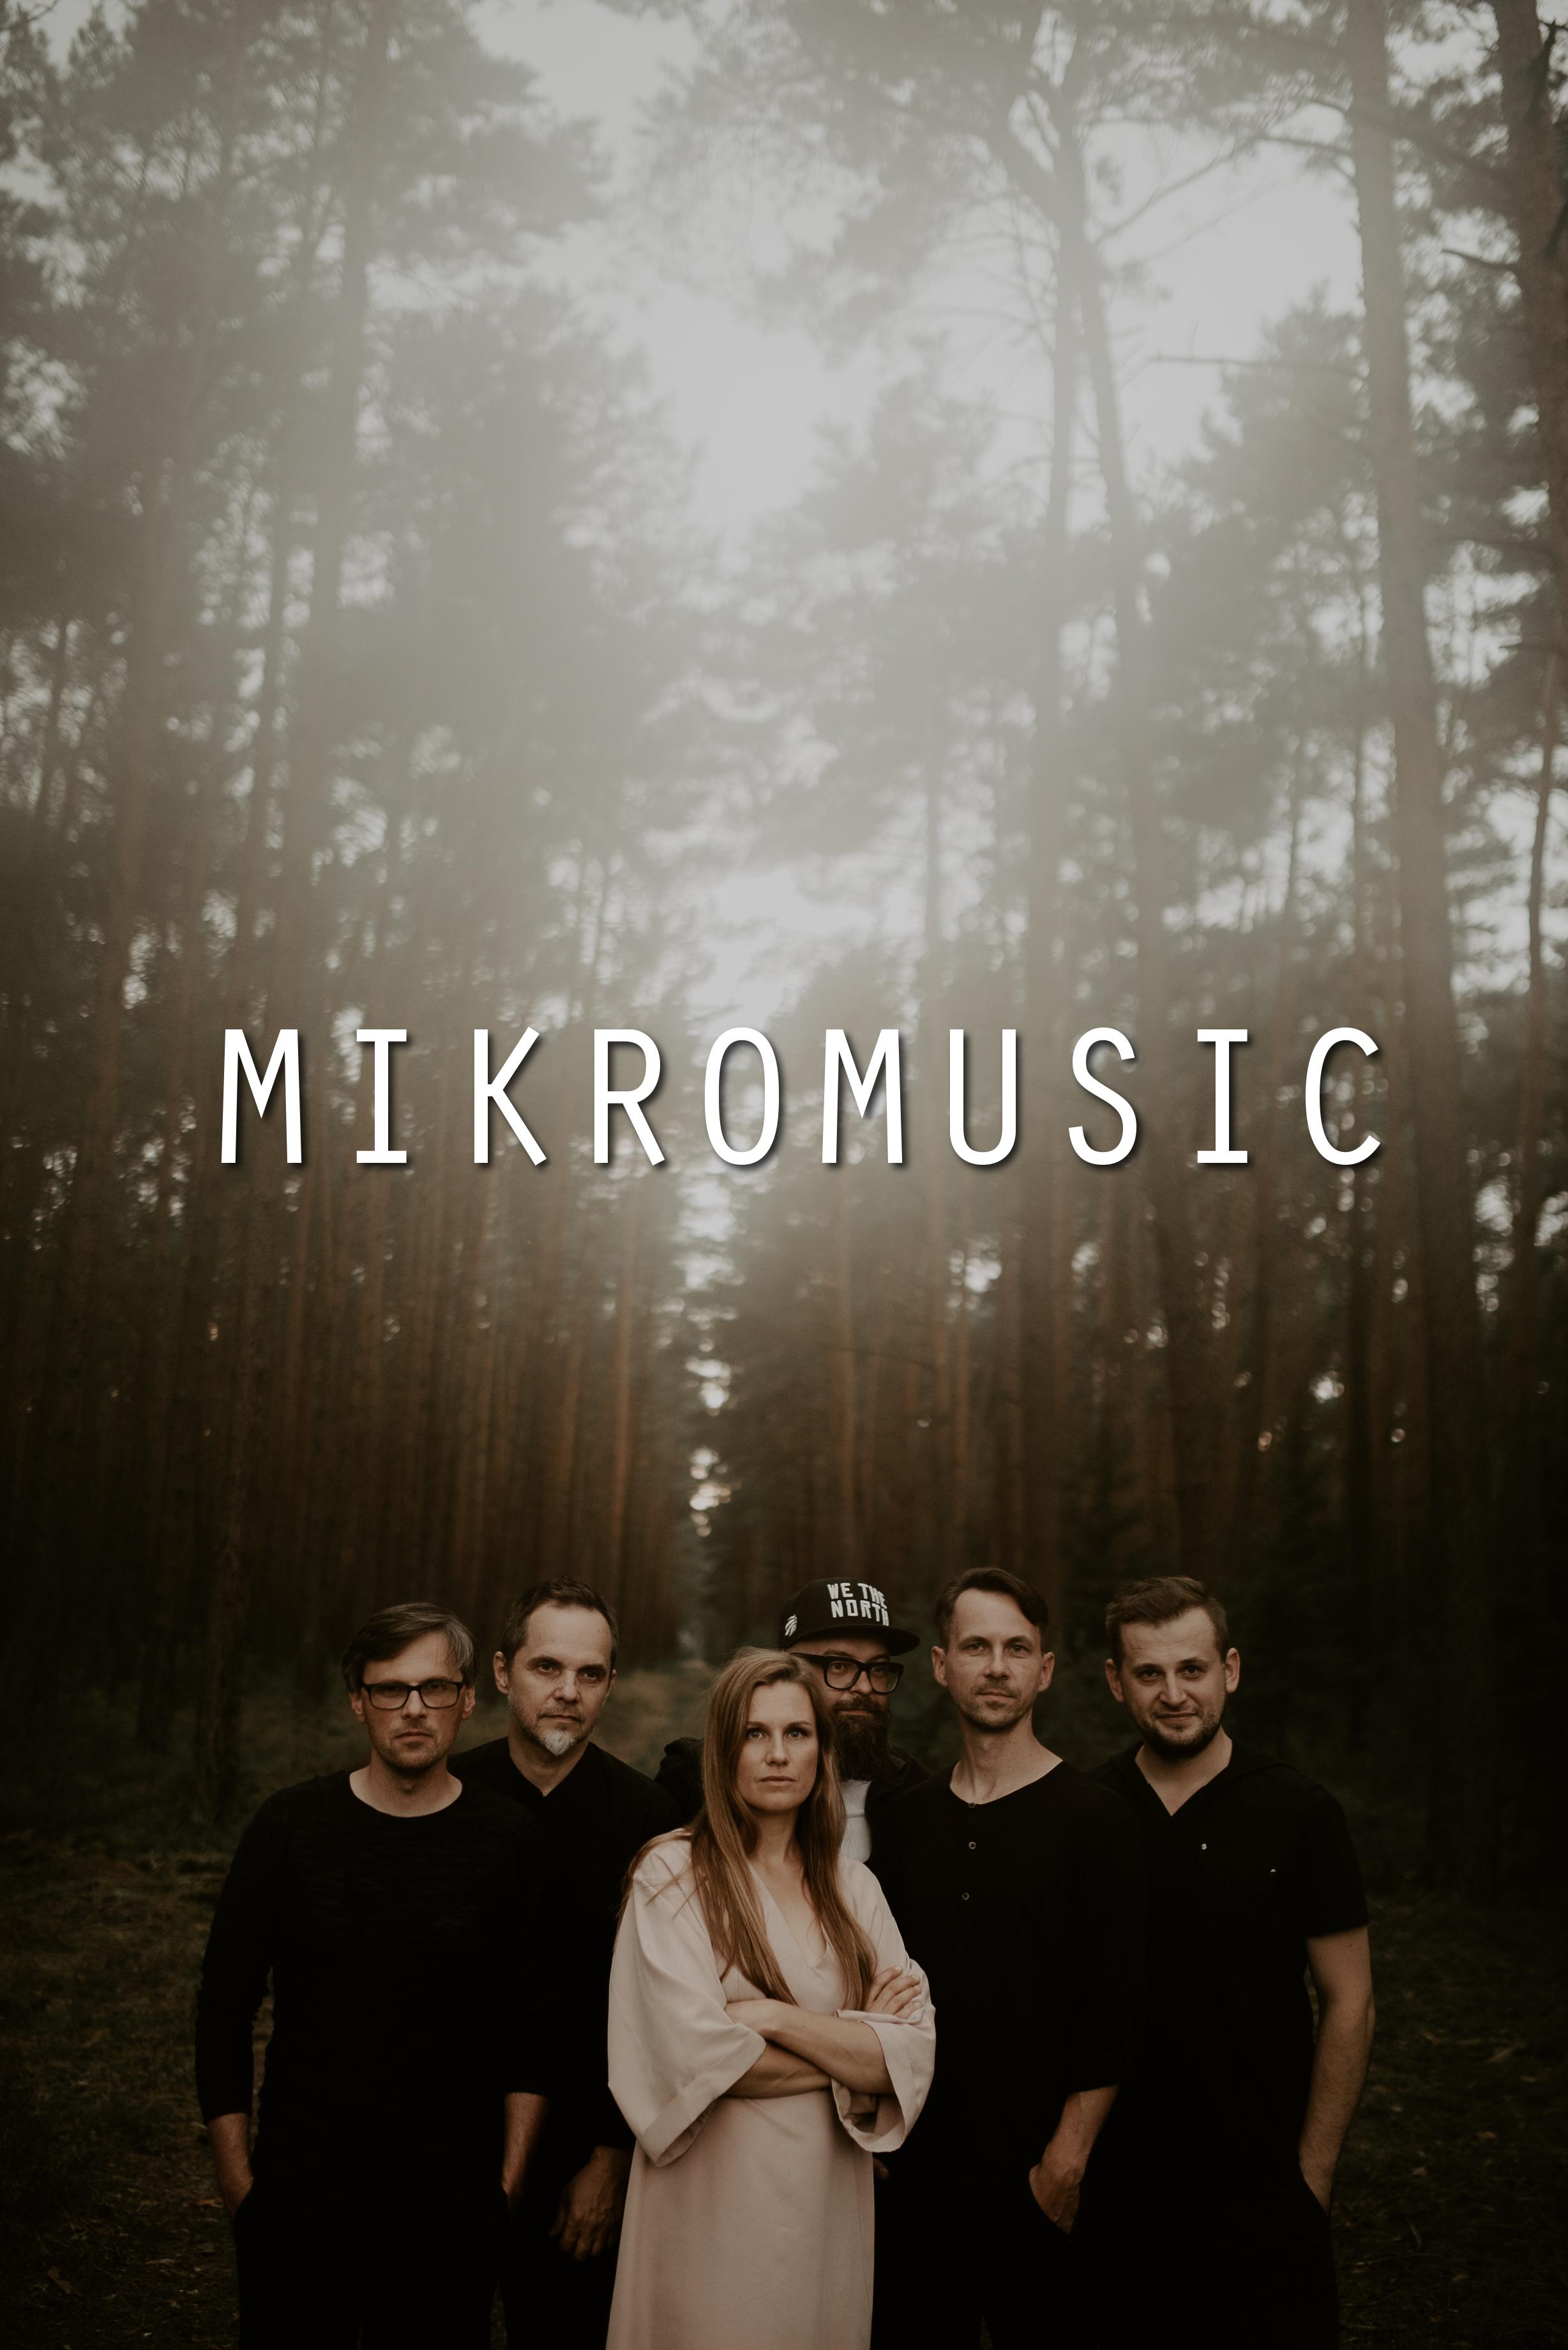 Mikromusic - Dublin - Impressario: Alternative4